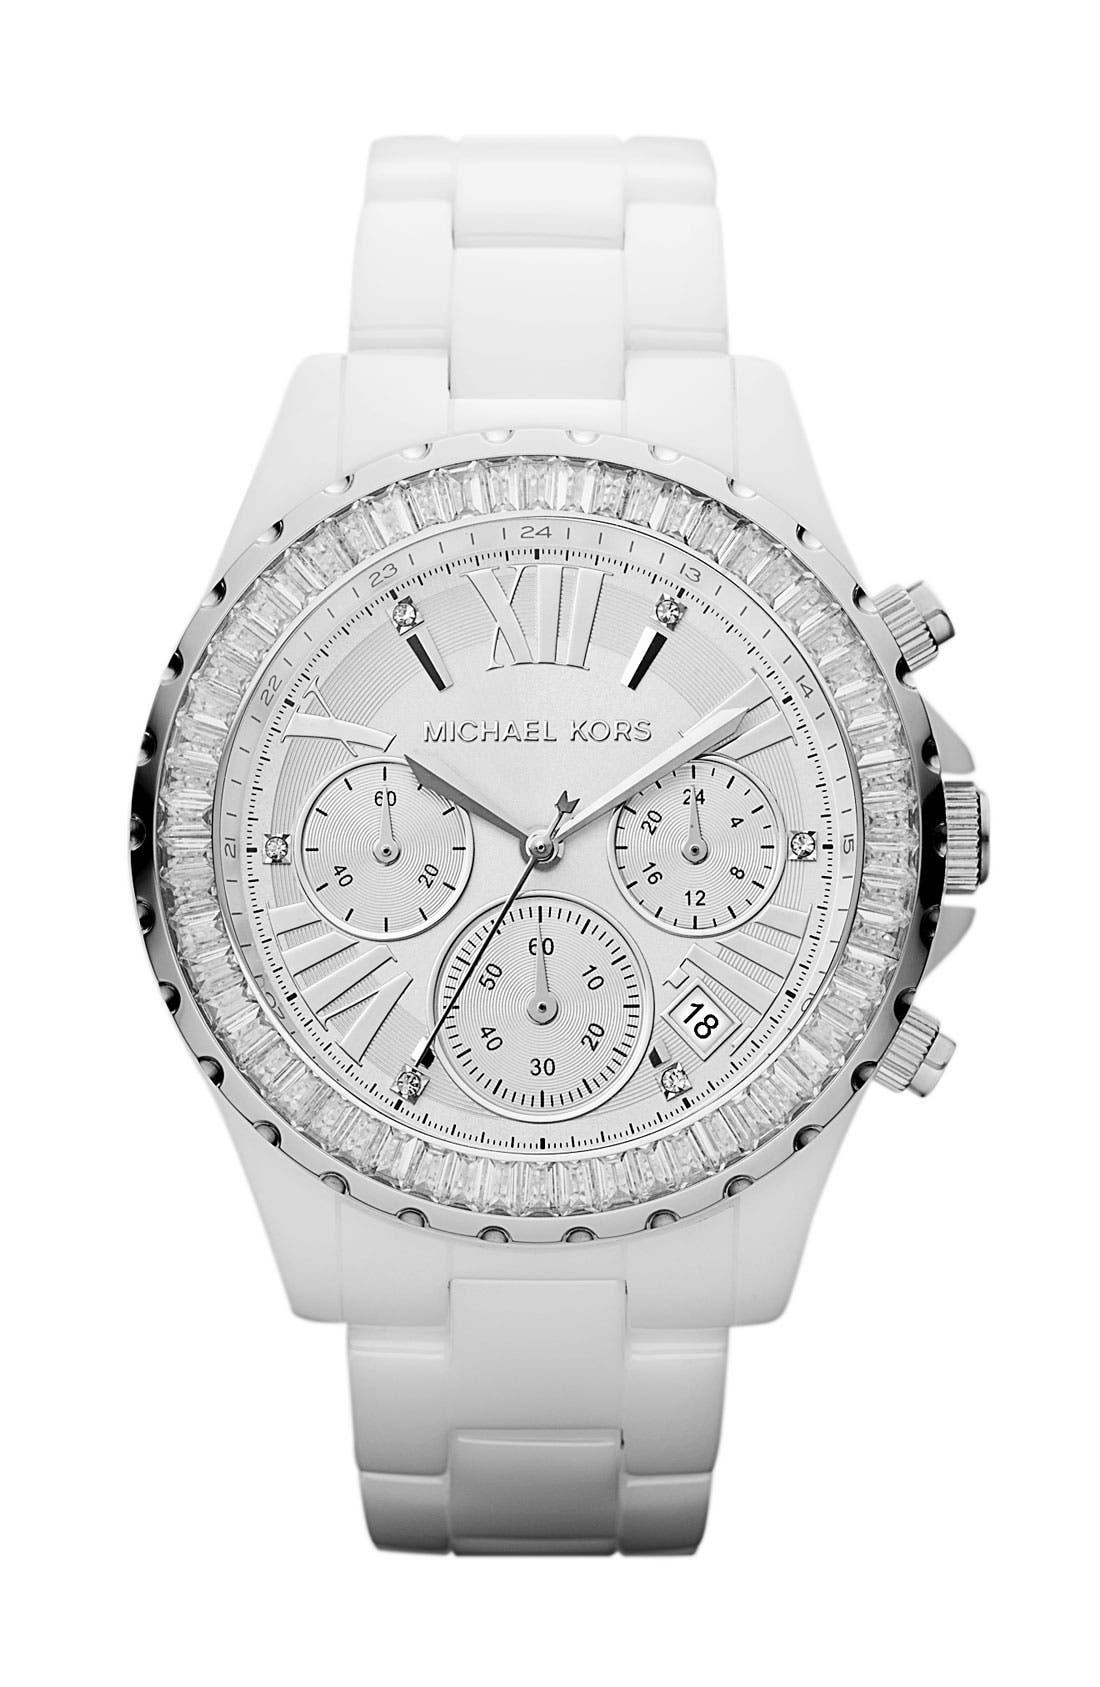 Main Image - Michael Kors 'Madison' Crystal Bezel Ceramic Watch, 41mm